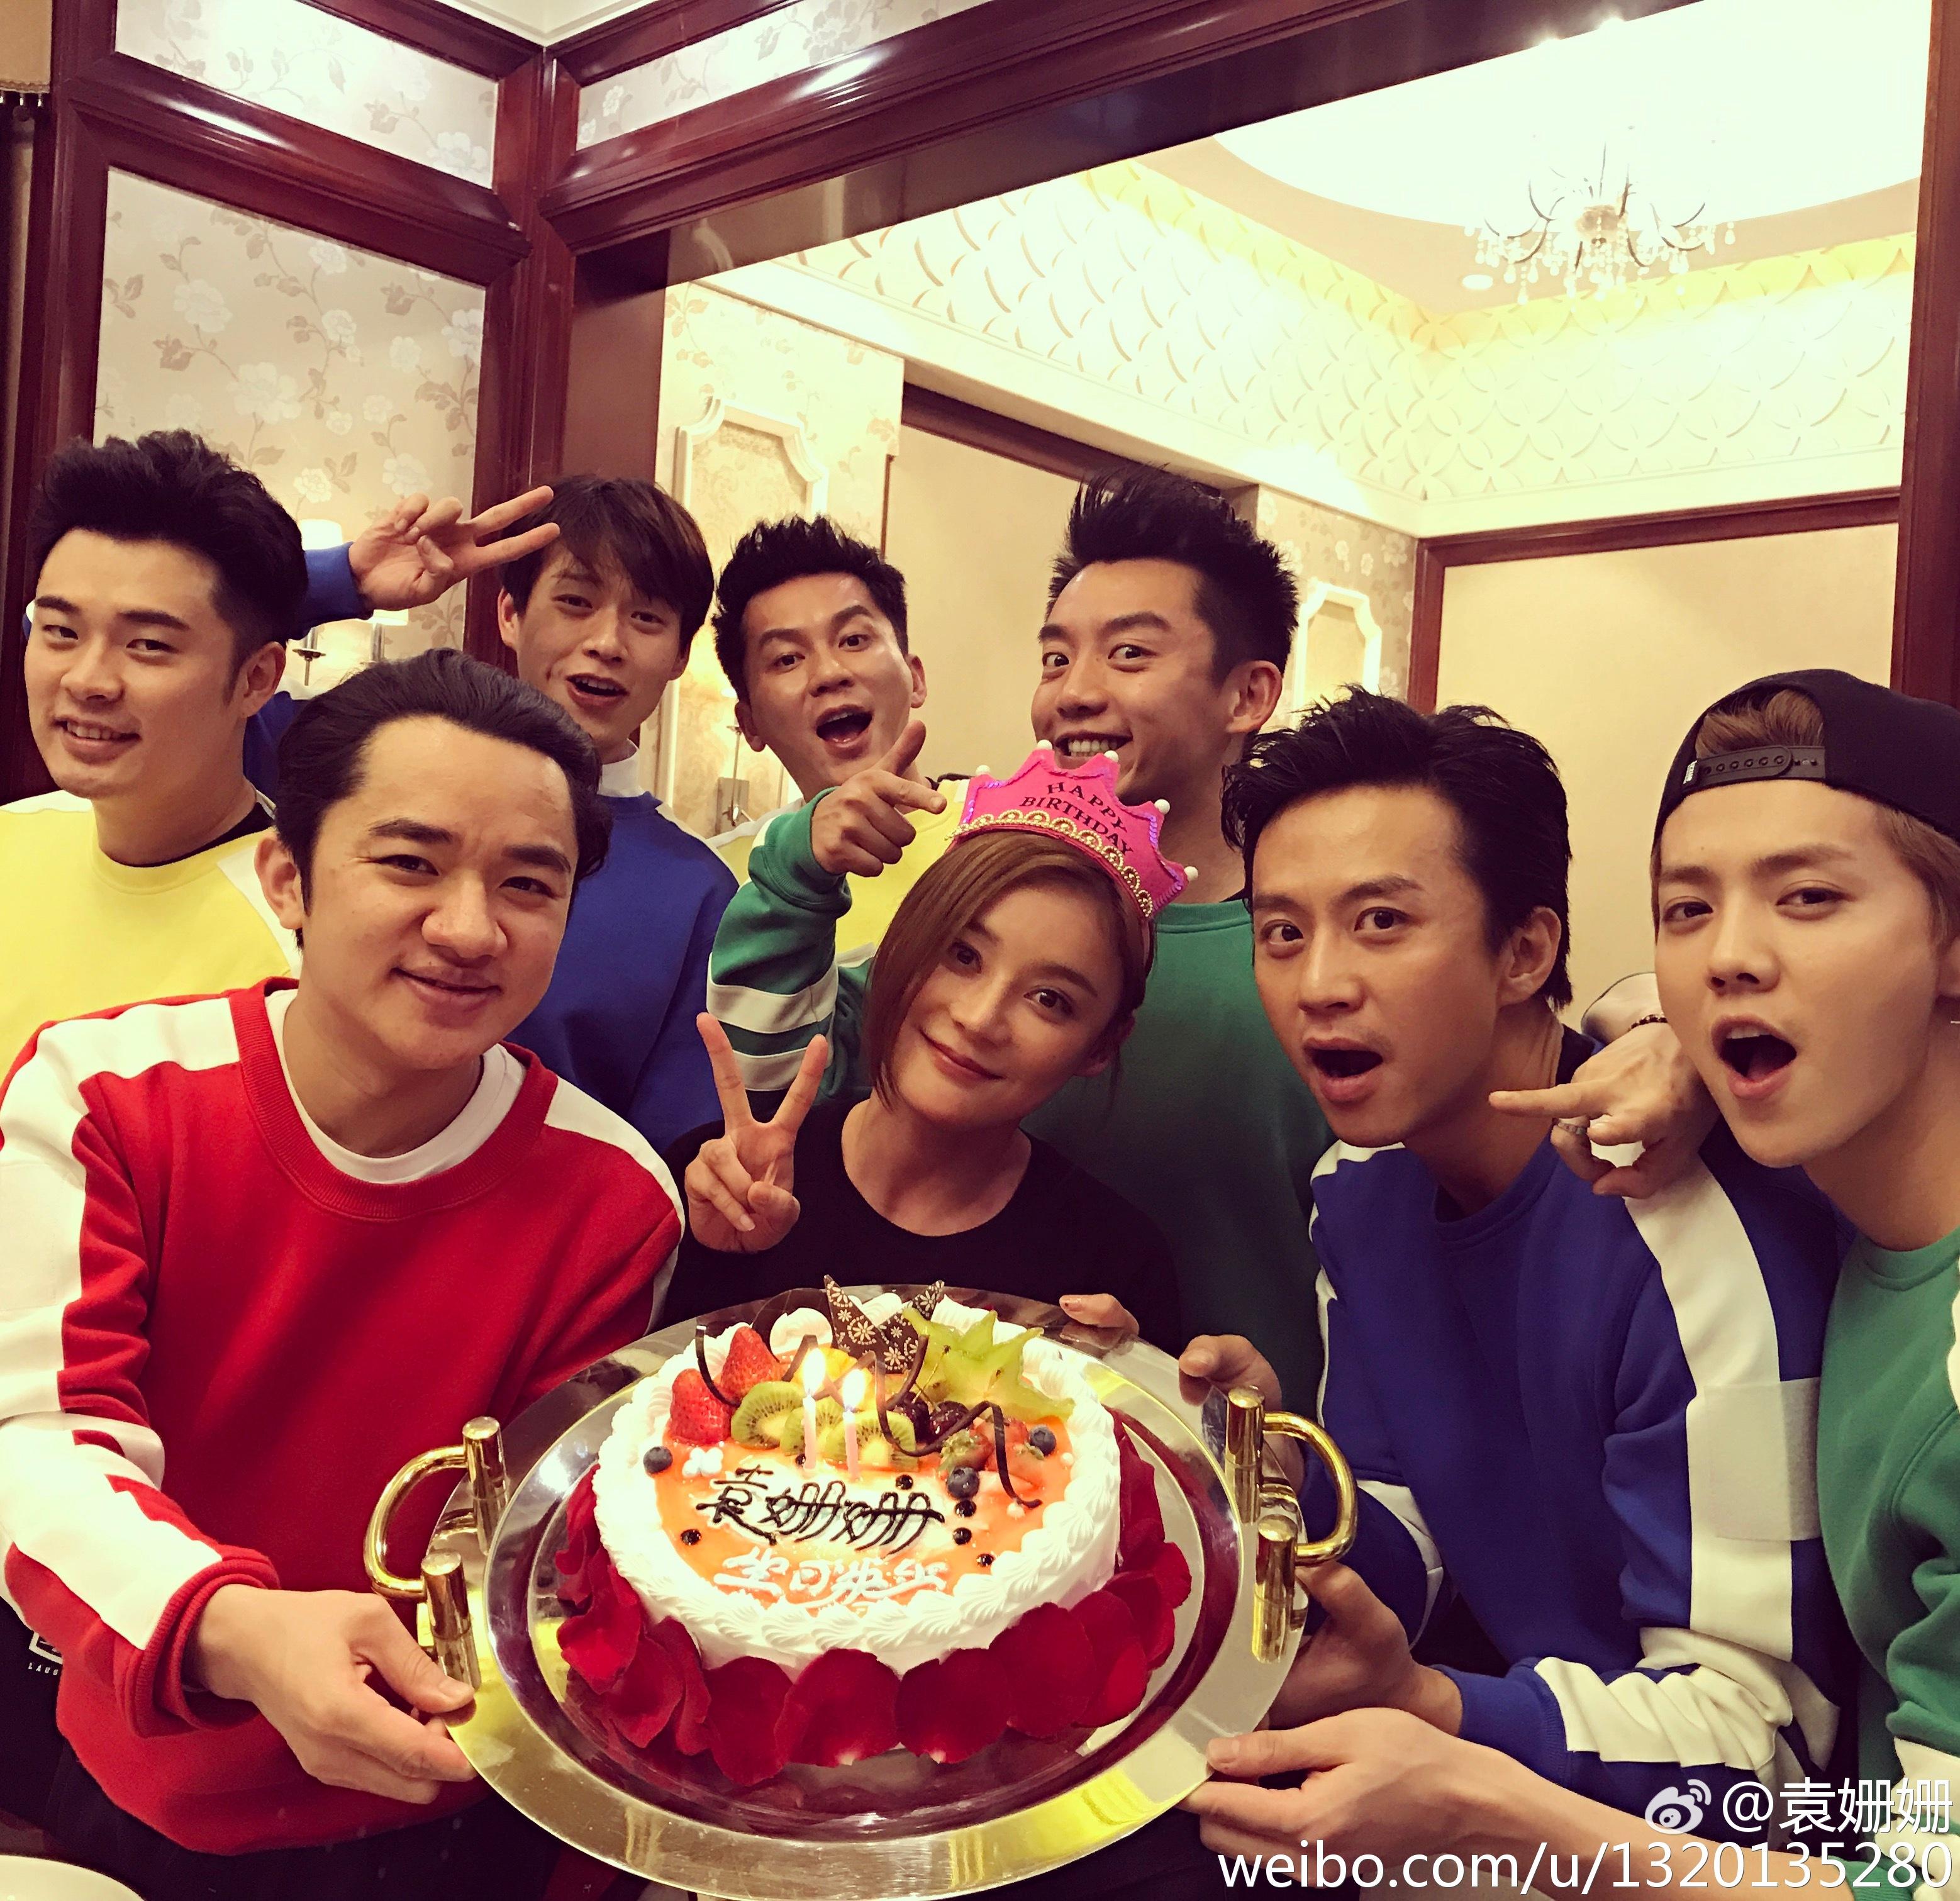 Baekhyun & Luhan Iranian Fan Club